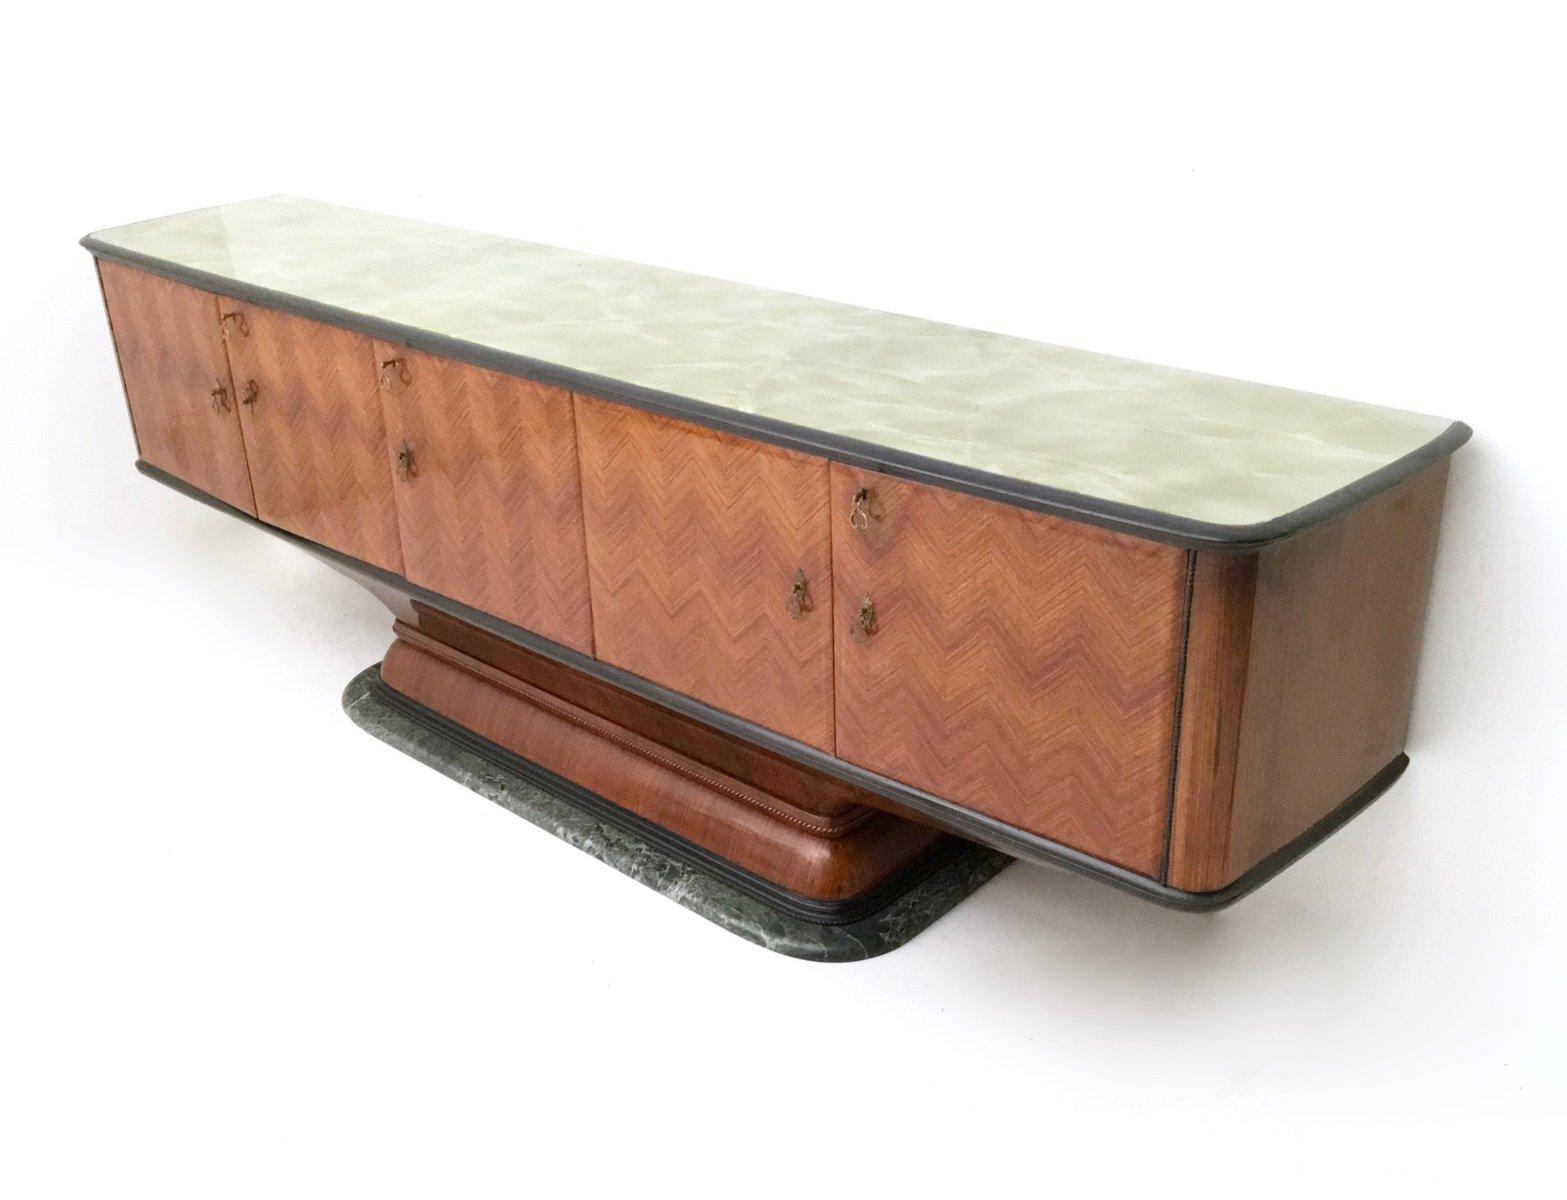 palisander sideboard mit gr nem marmorfu schwarz lackierter tischplatte aus glas 1950er bei. Black Bedroom Furniture Sets. Home Design Ideas